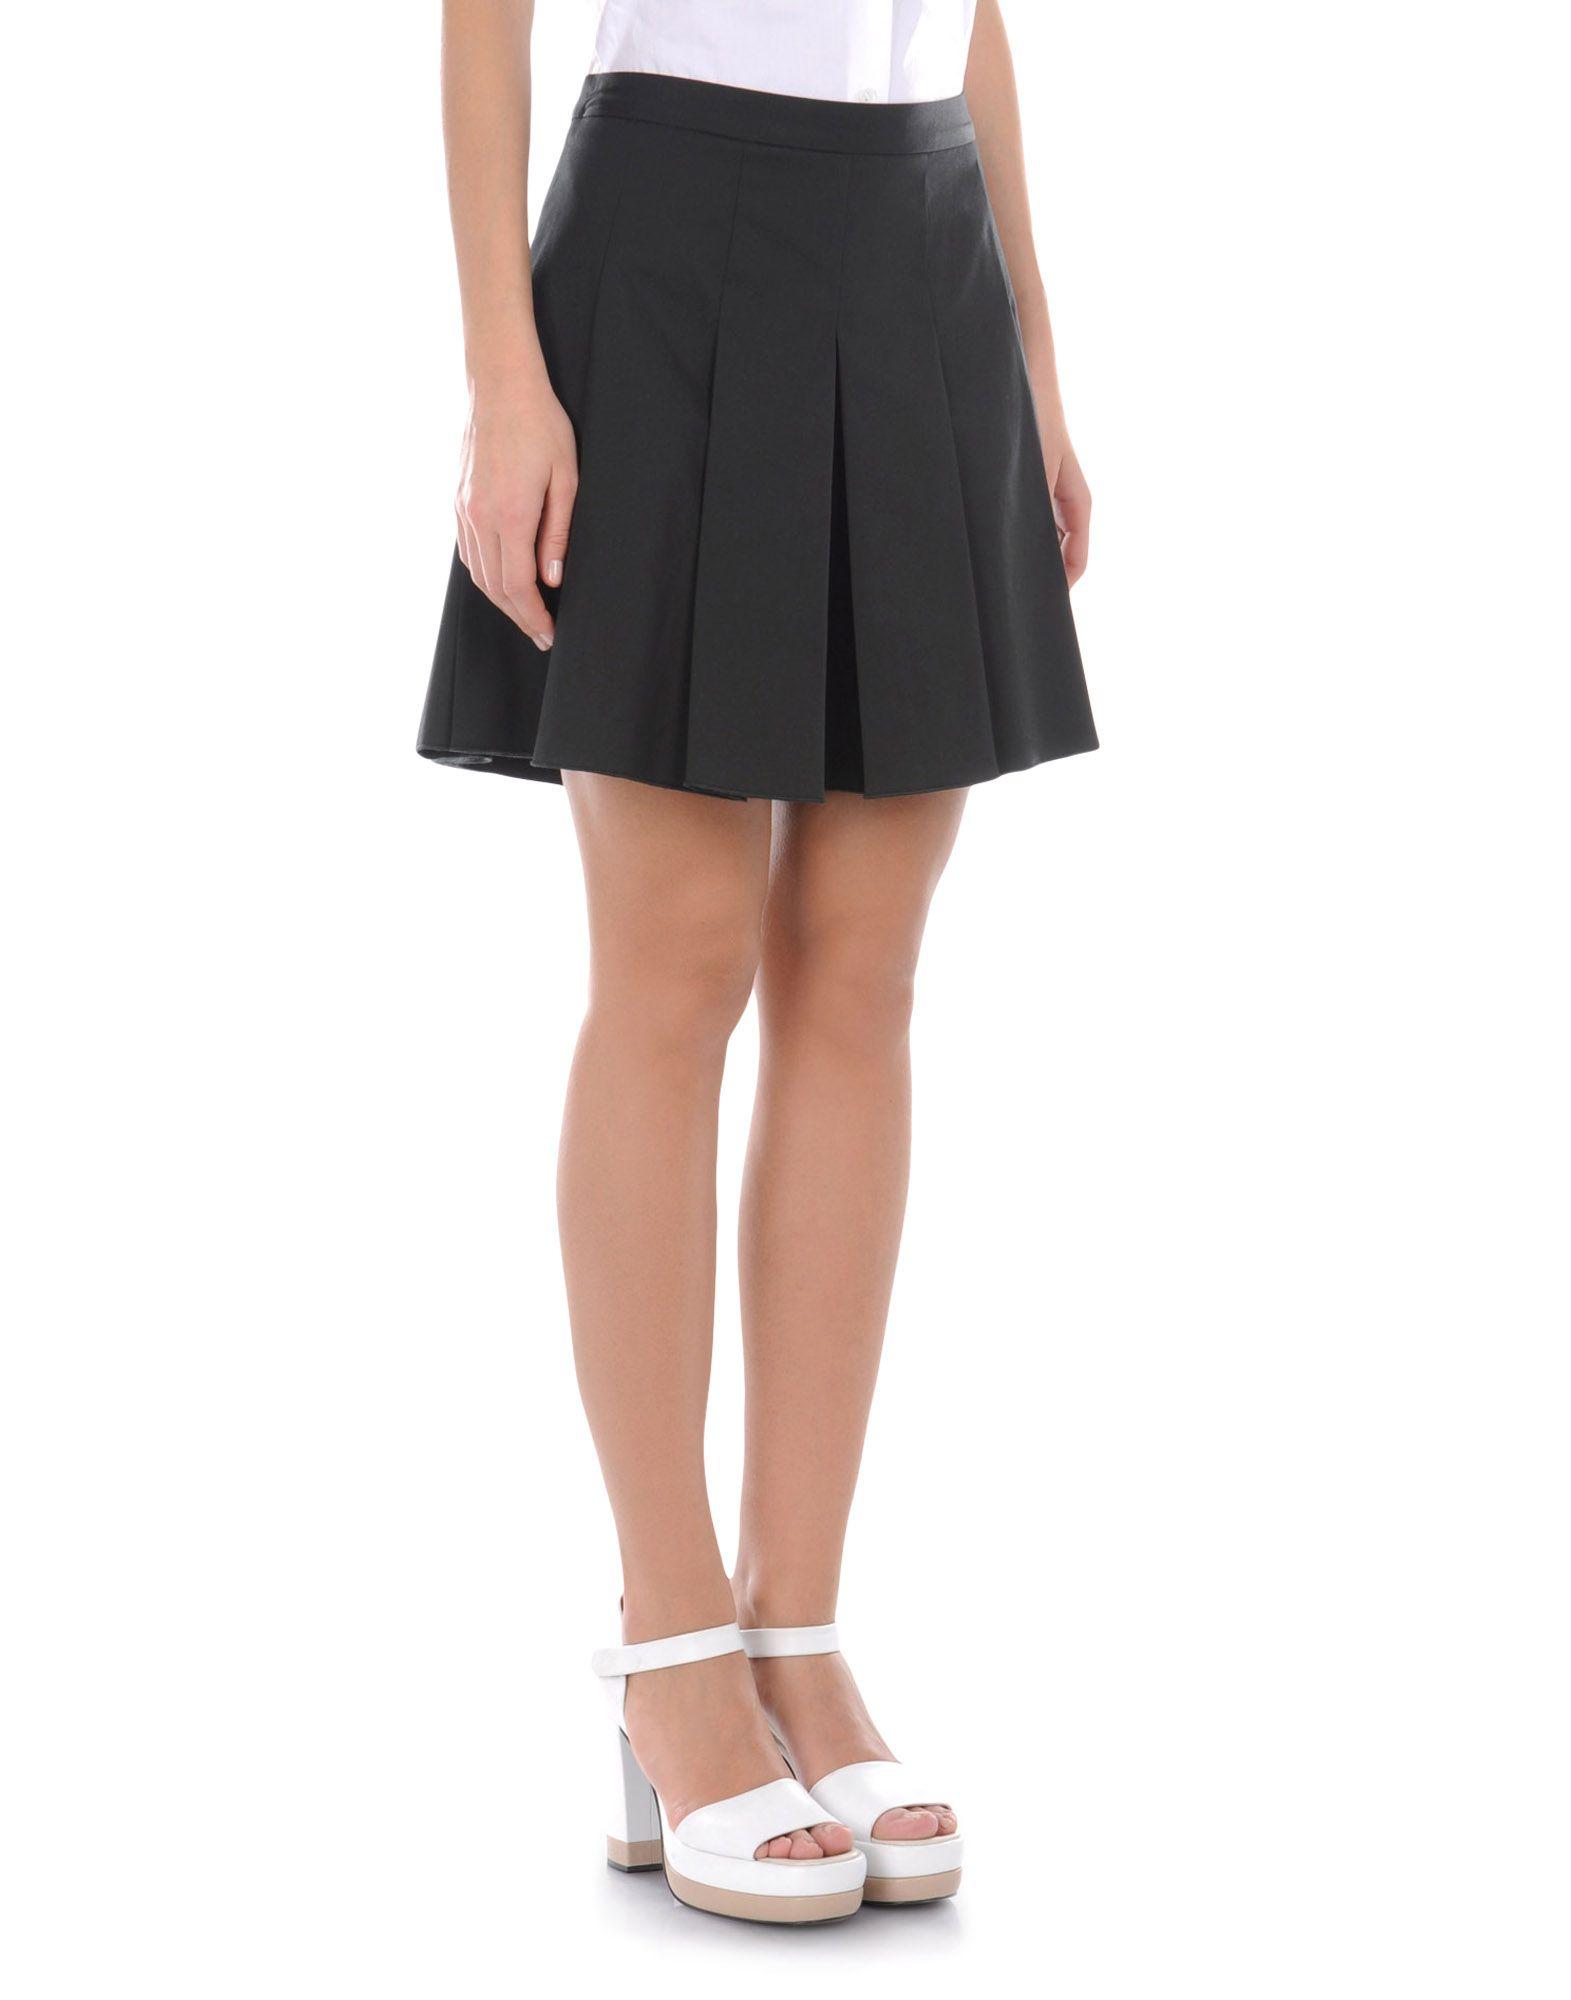 Shorts - JIL SANDER NAVY Online Store